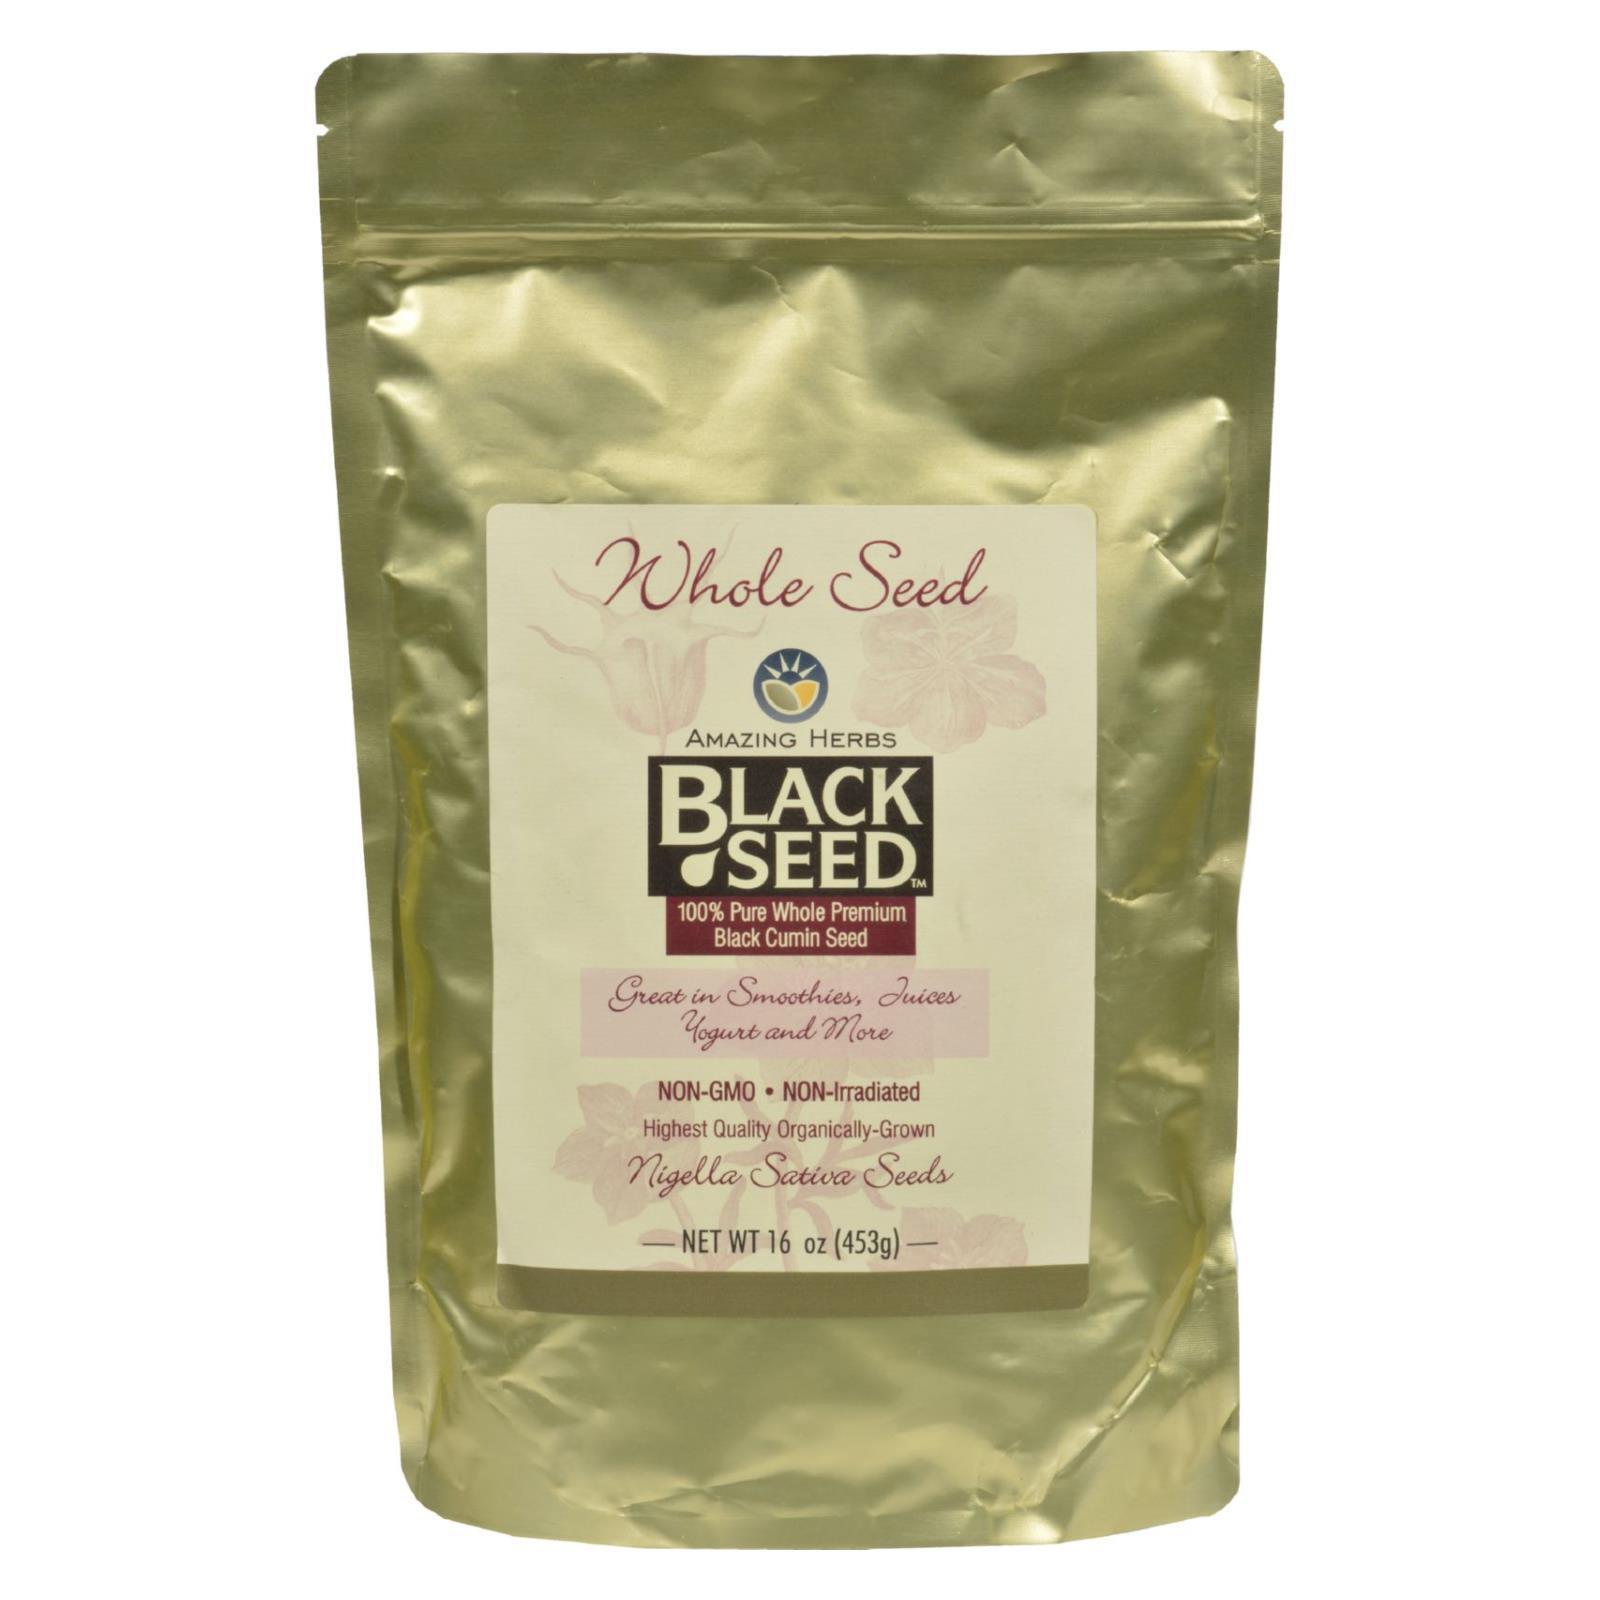 Amazing Herbs Black Seed Whole Seed - 16 oz